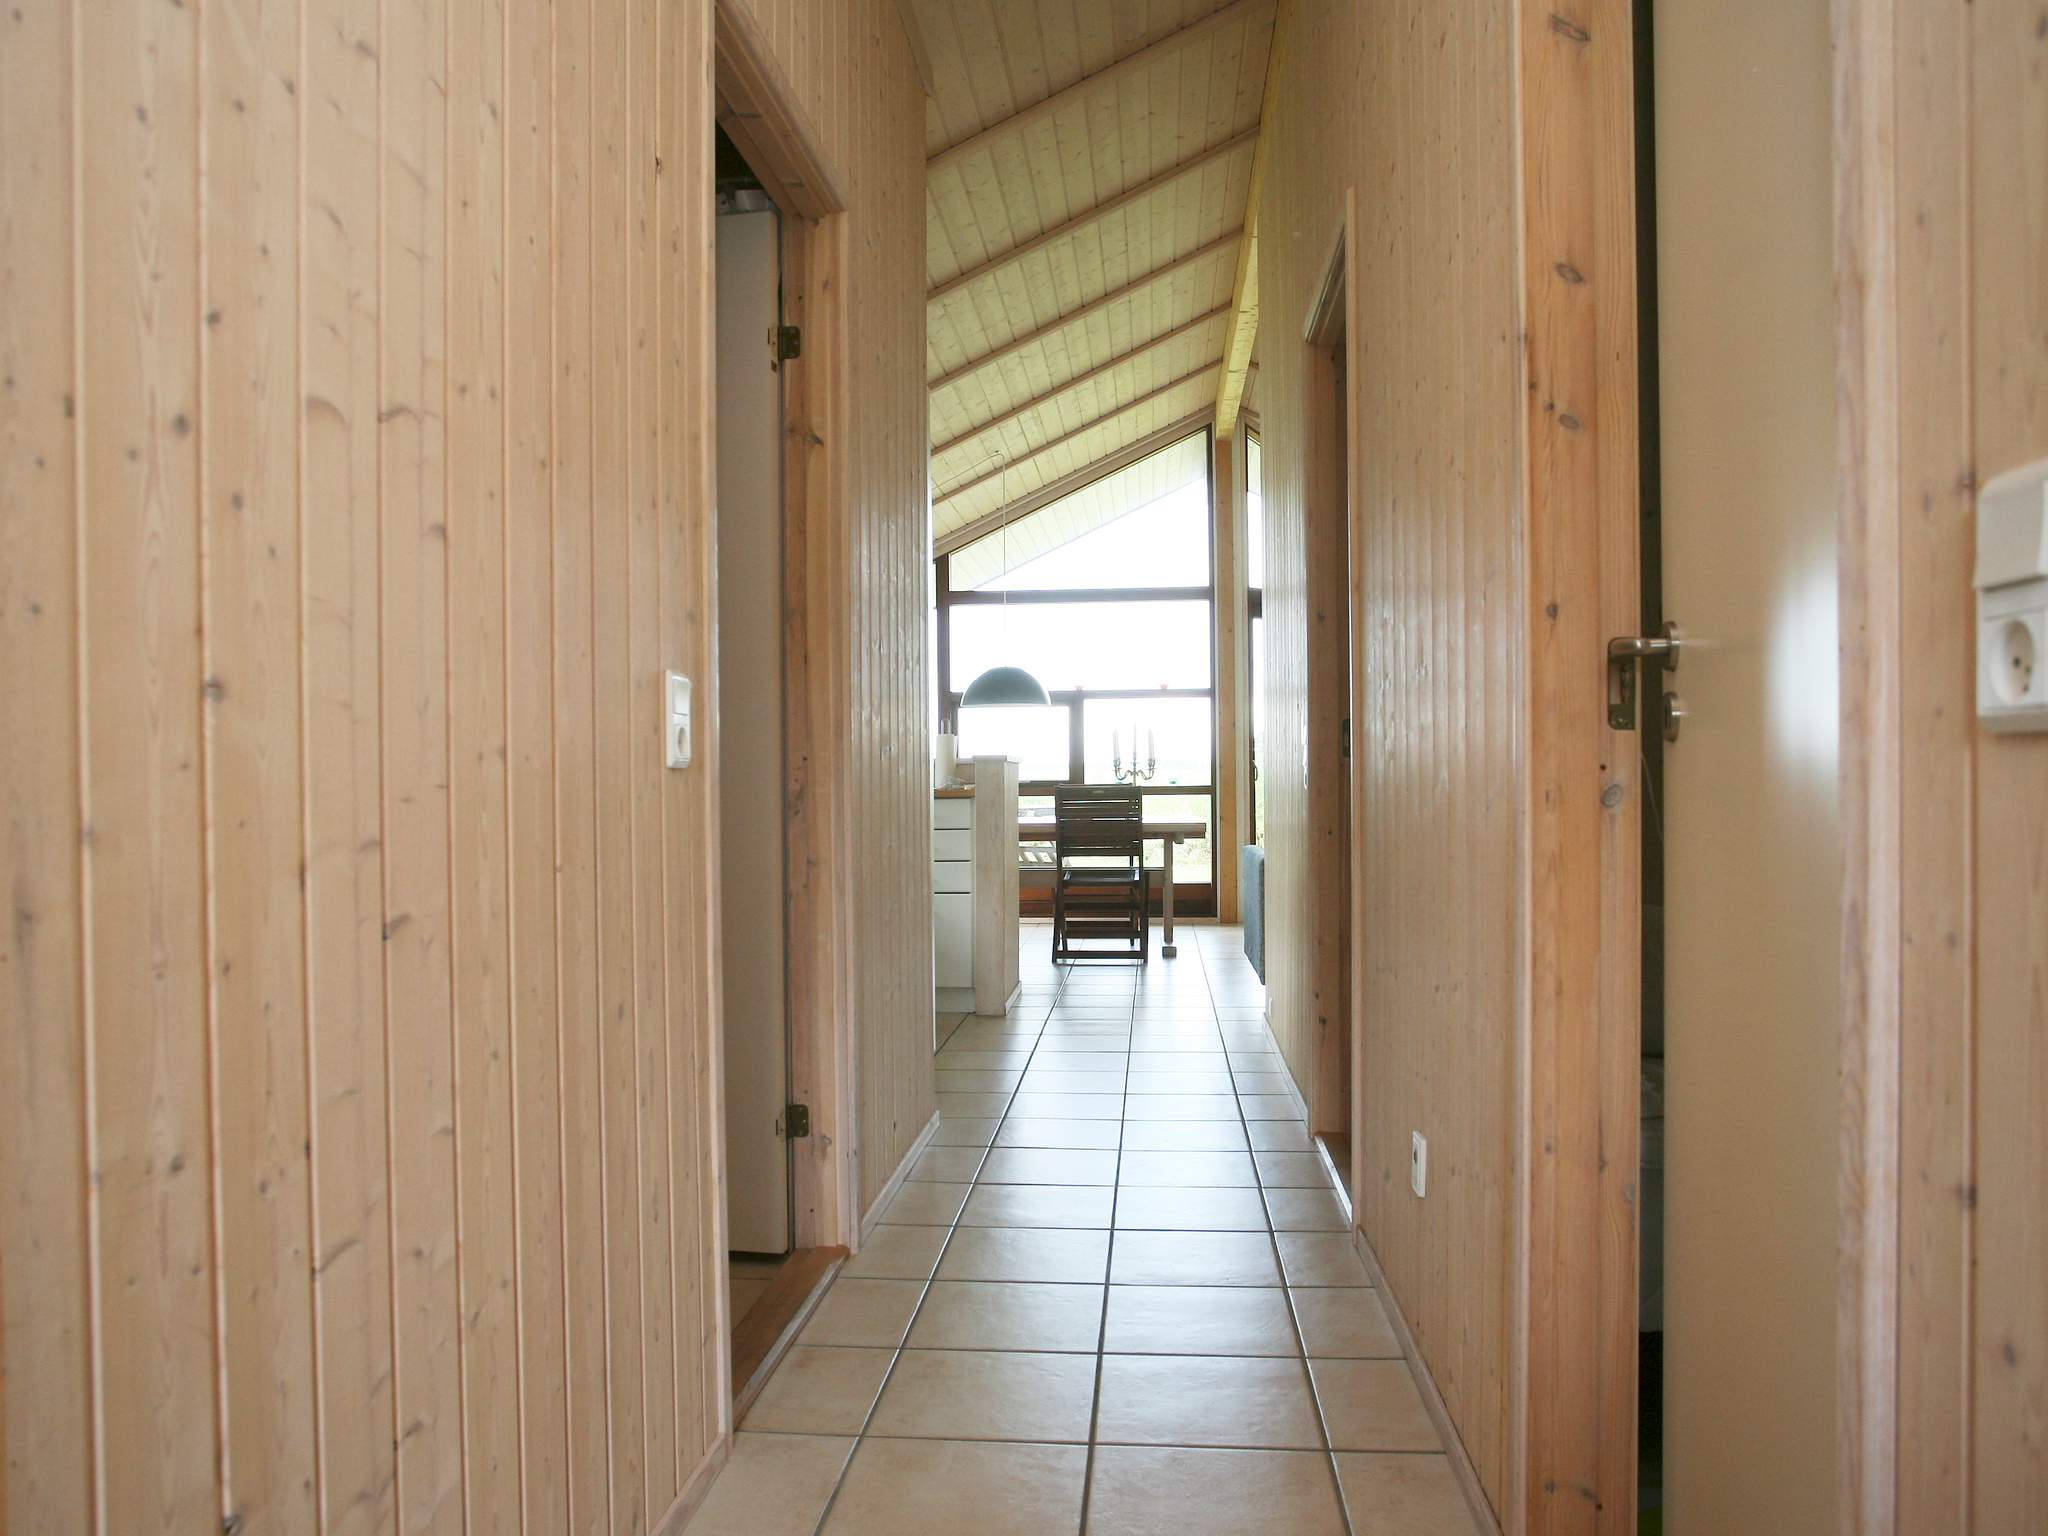 Ferienhaus Ore Strand (300650), Oreby, , Südseeland, Dänemark, Bild 22